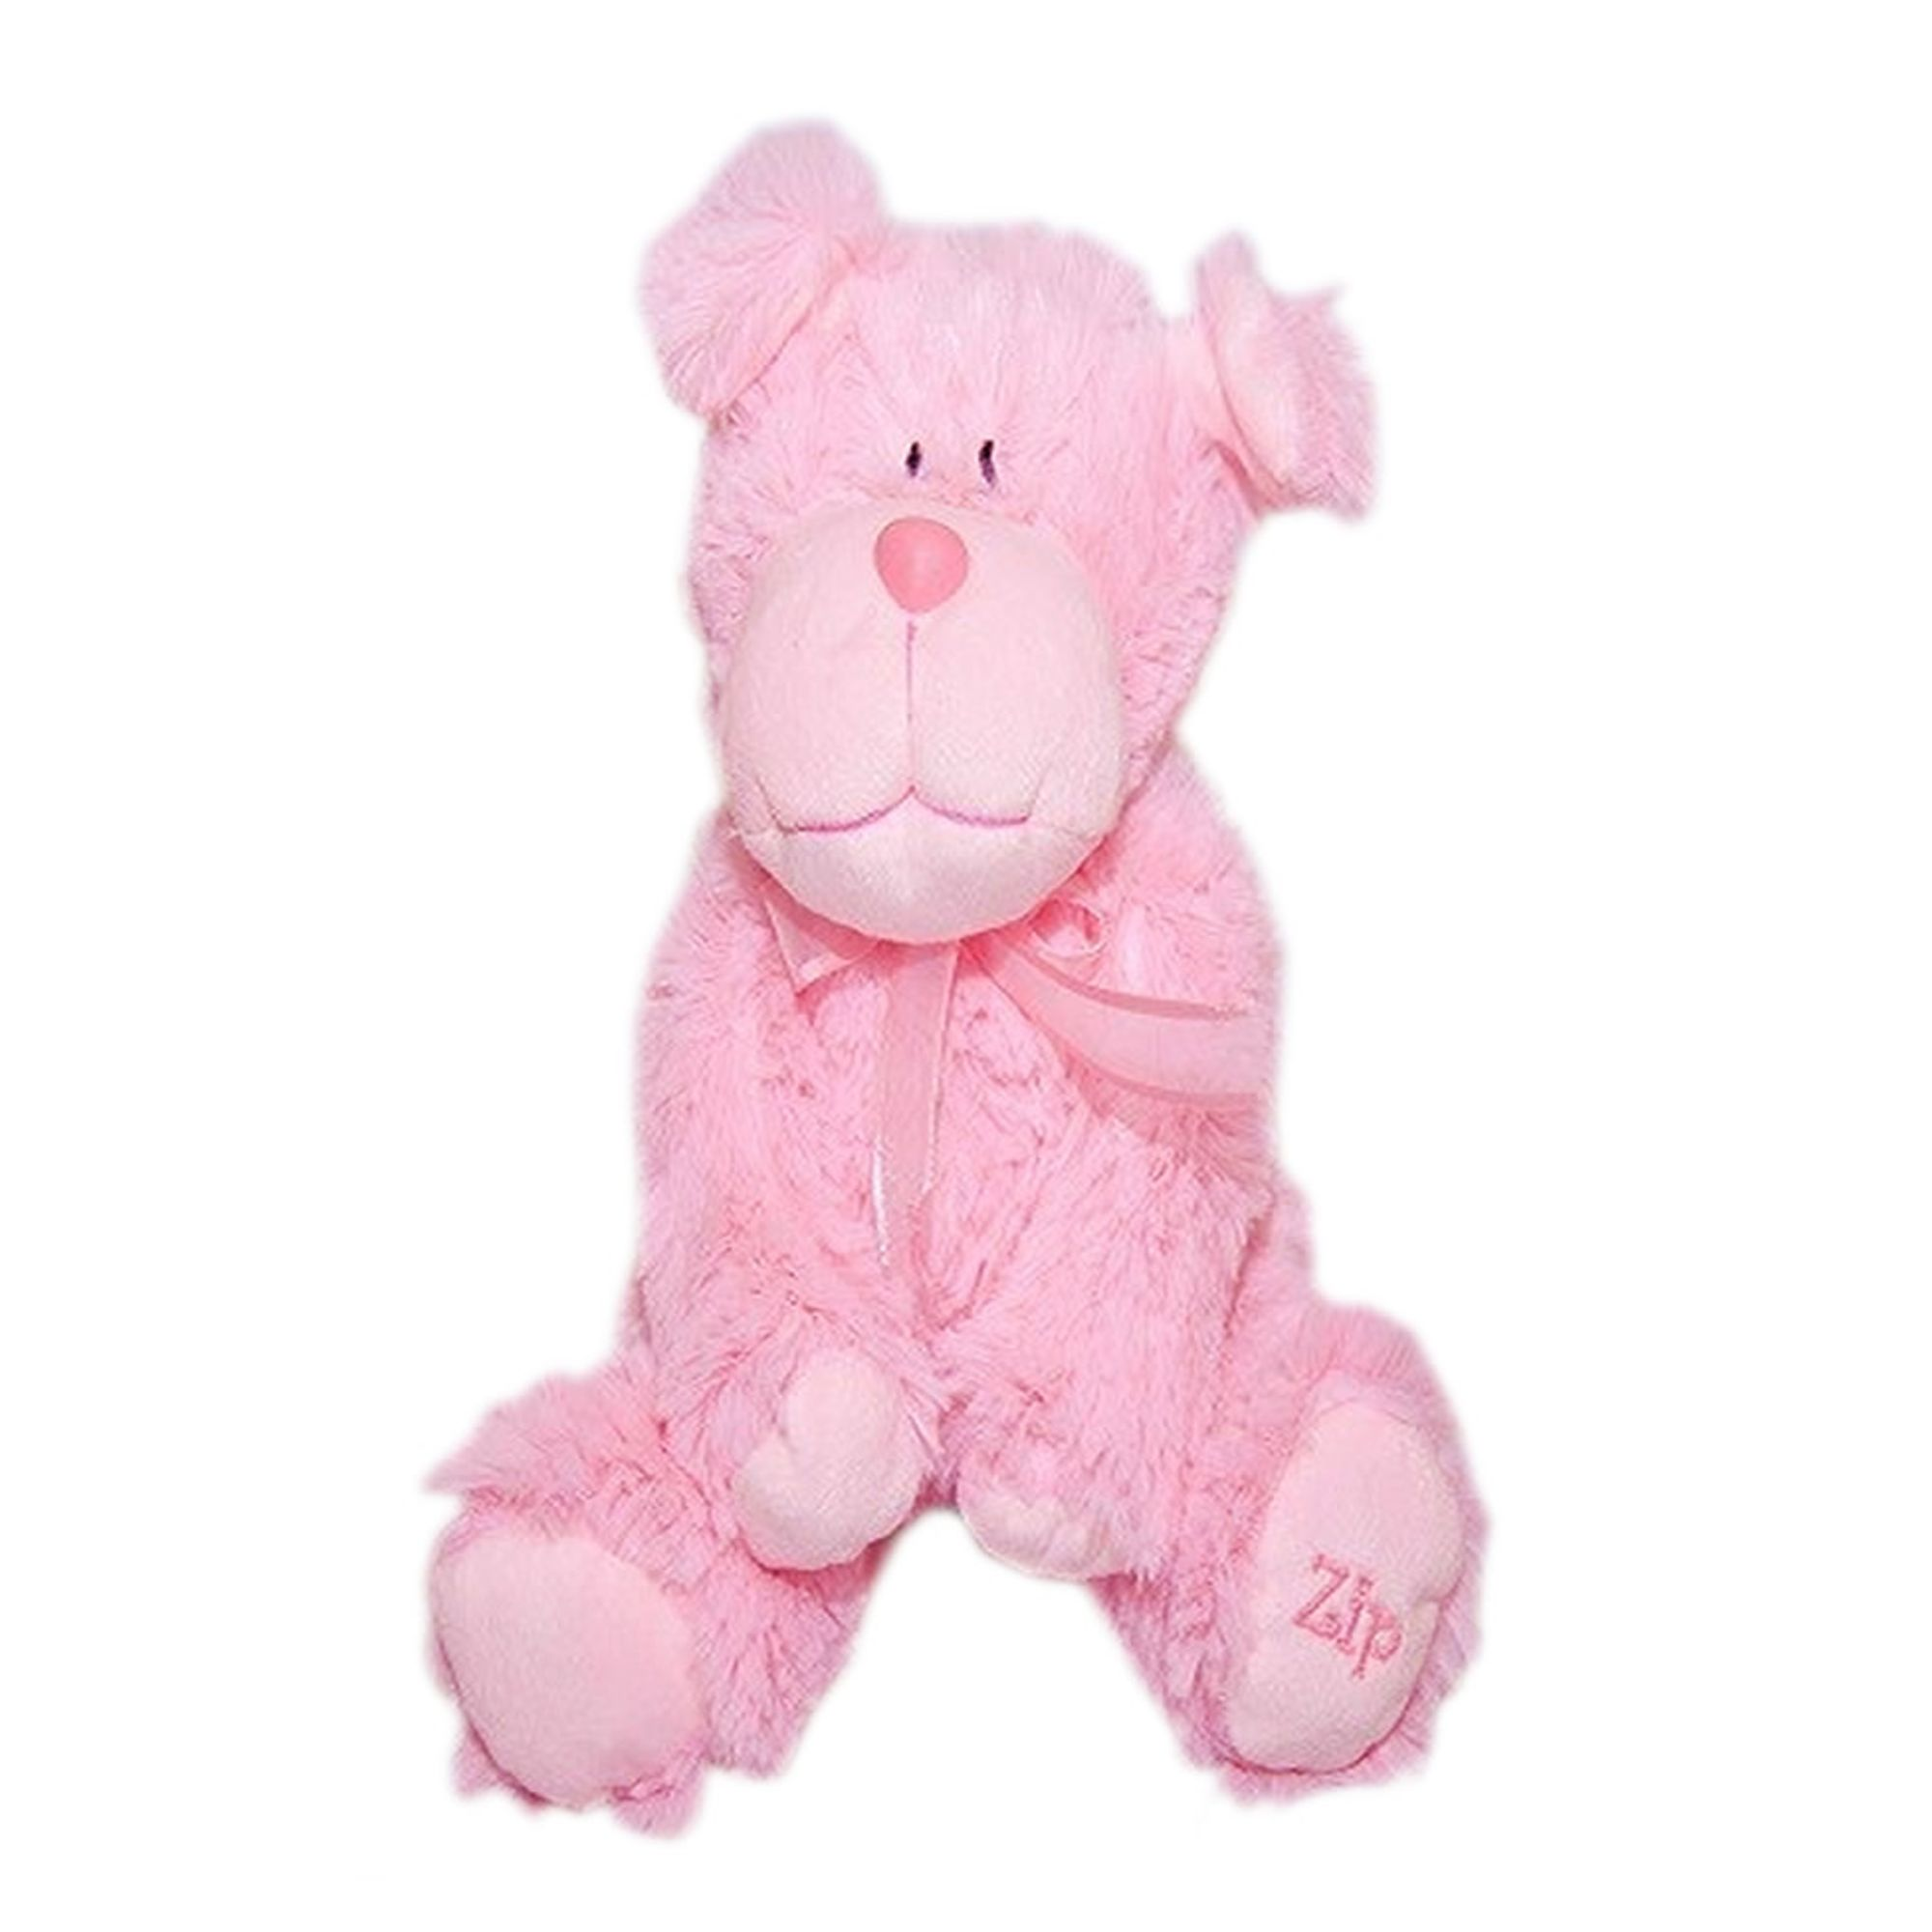 cachorrinho-pelucia-peteca-rosa-ziptoys